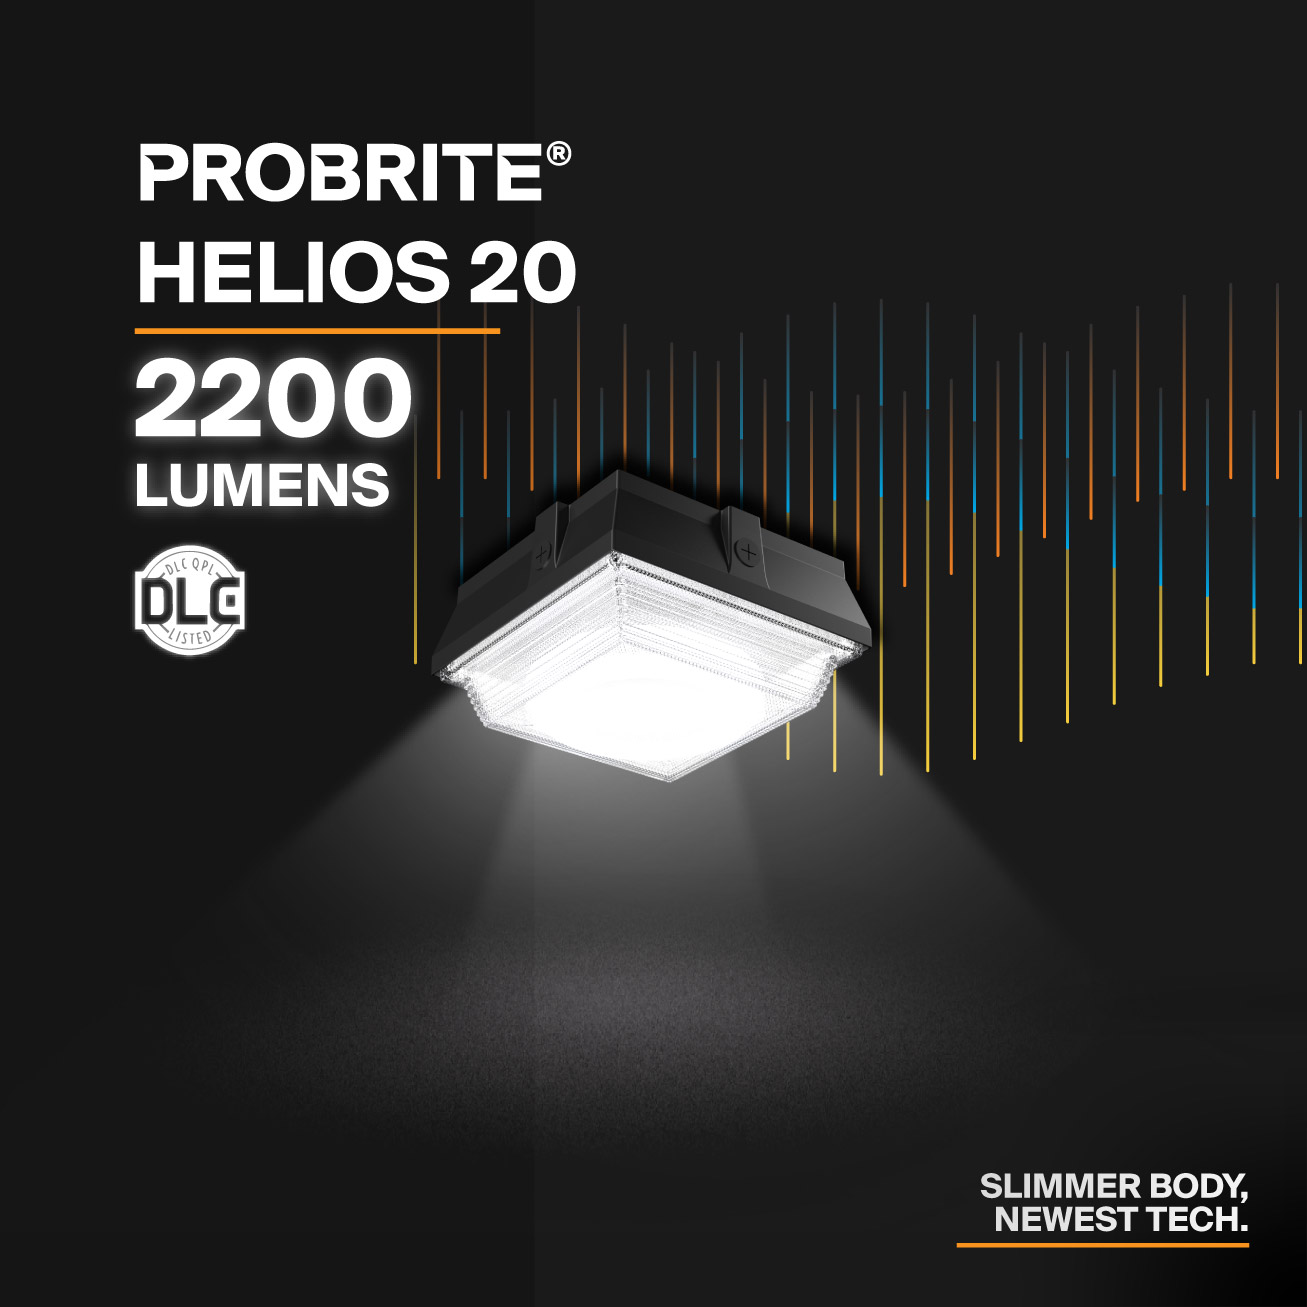 Probrite Helios20 LED Ceiling Light Slim Body